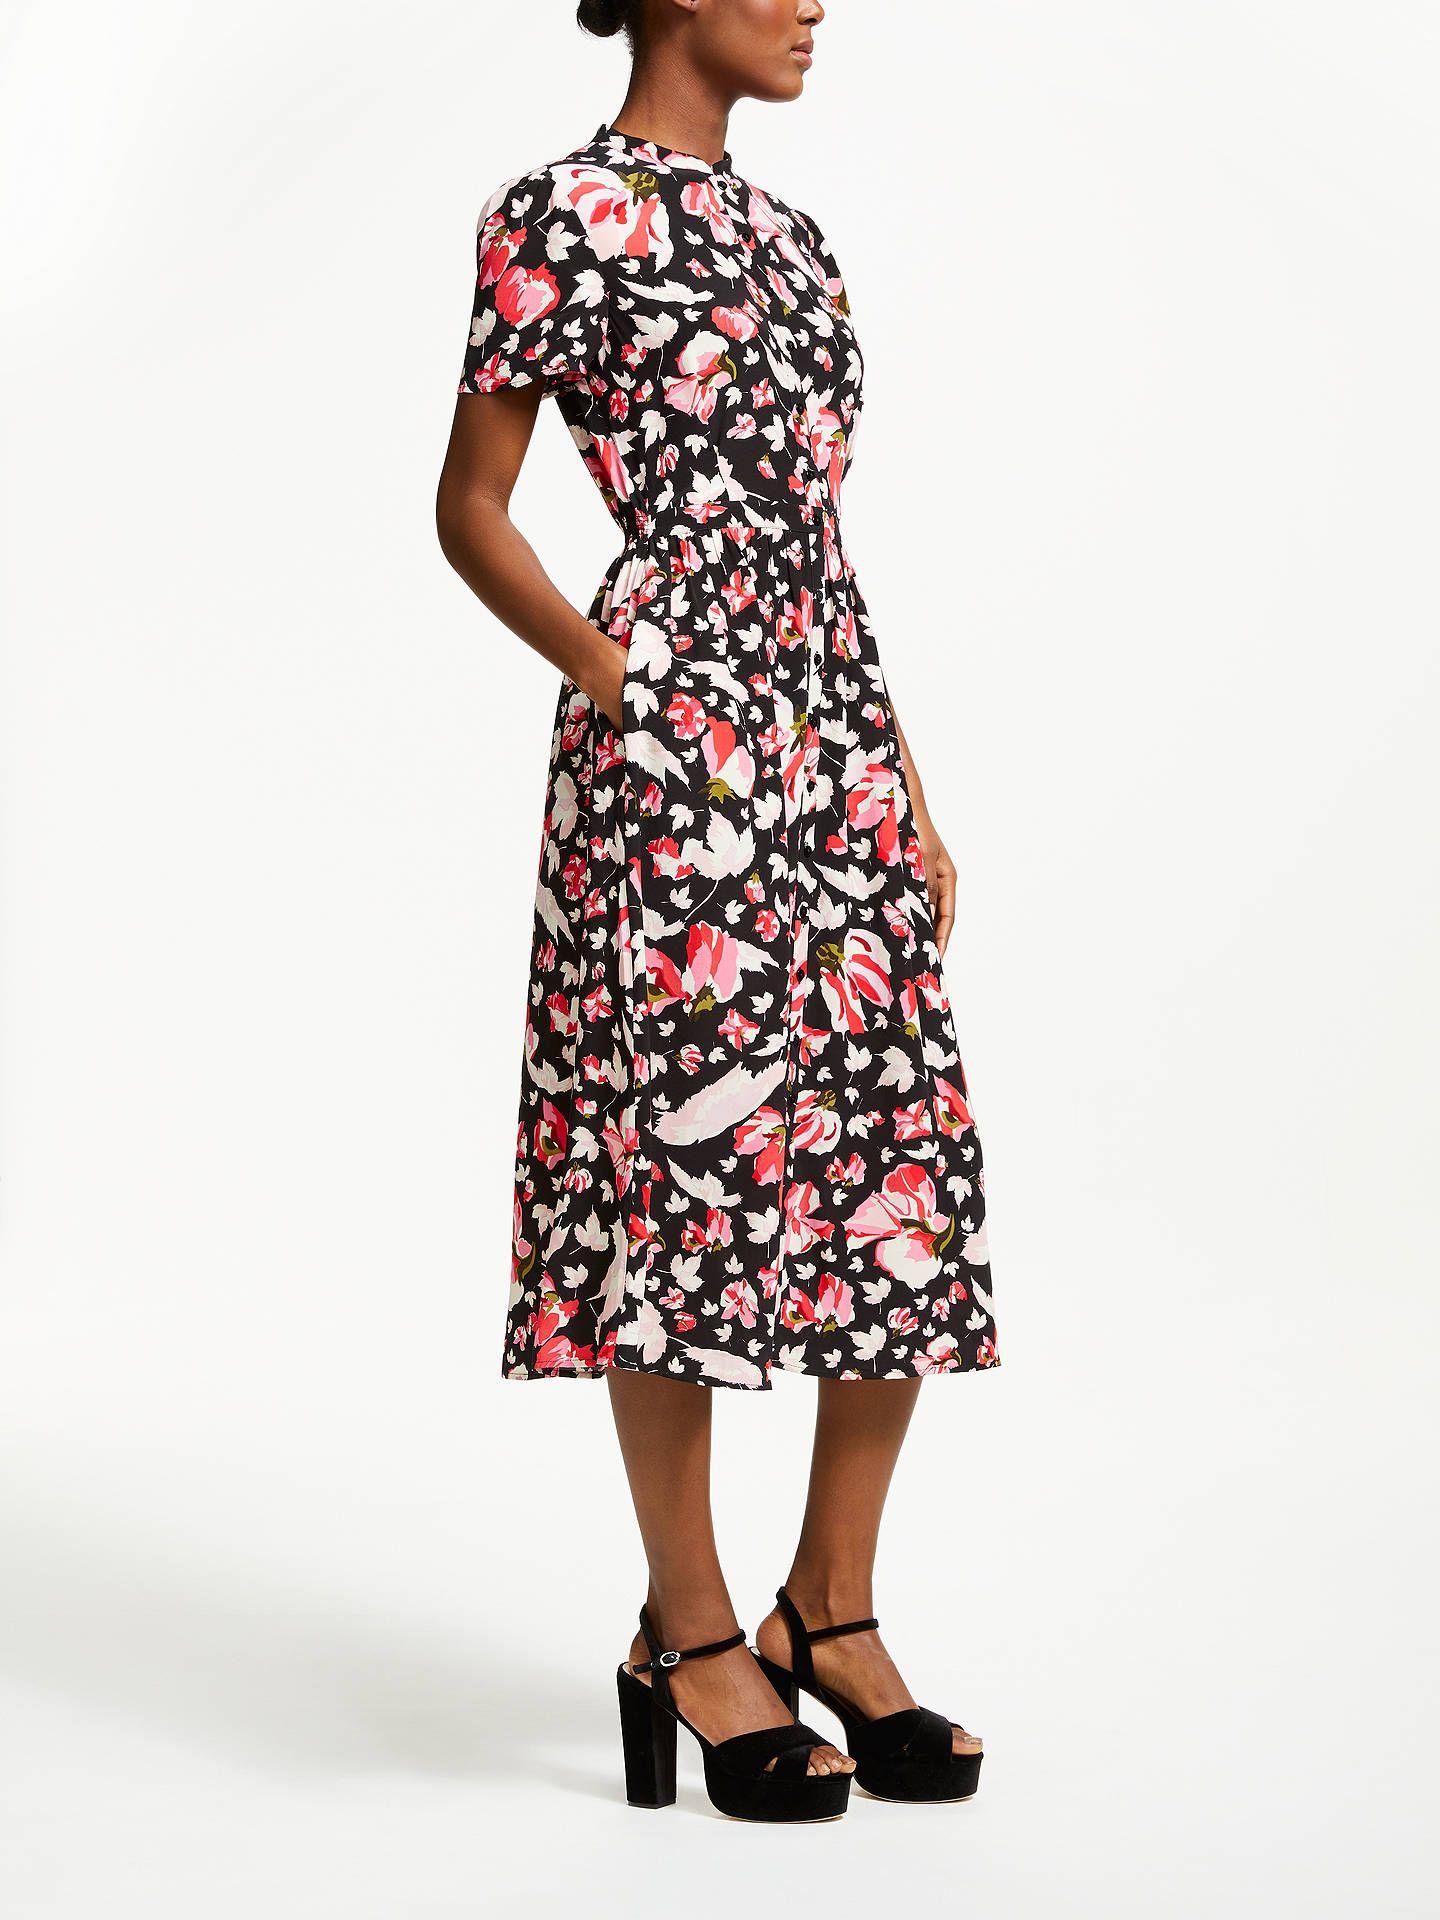 BuySomerset by Alice Temperley Carnation Print Shirt Dress e7443fb55